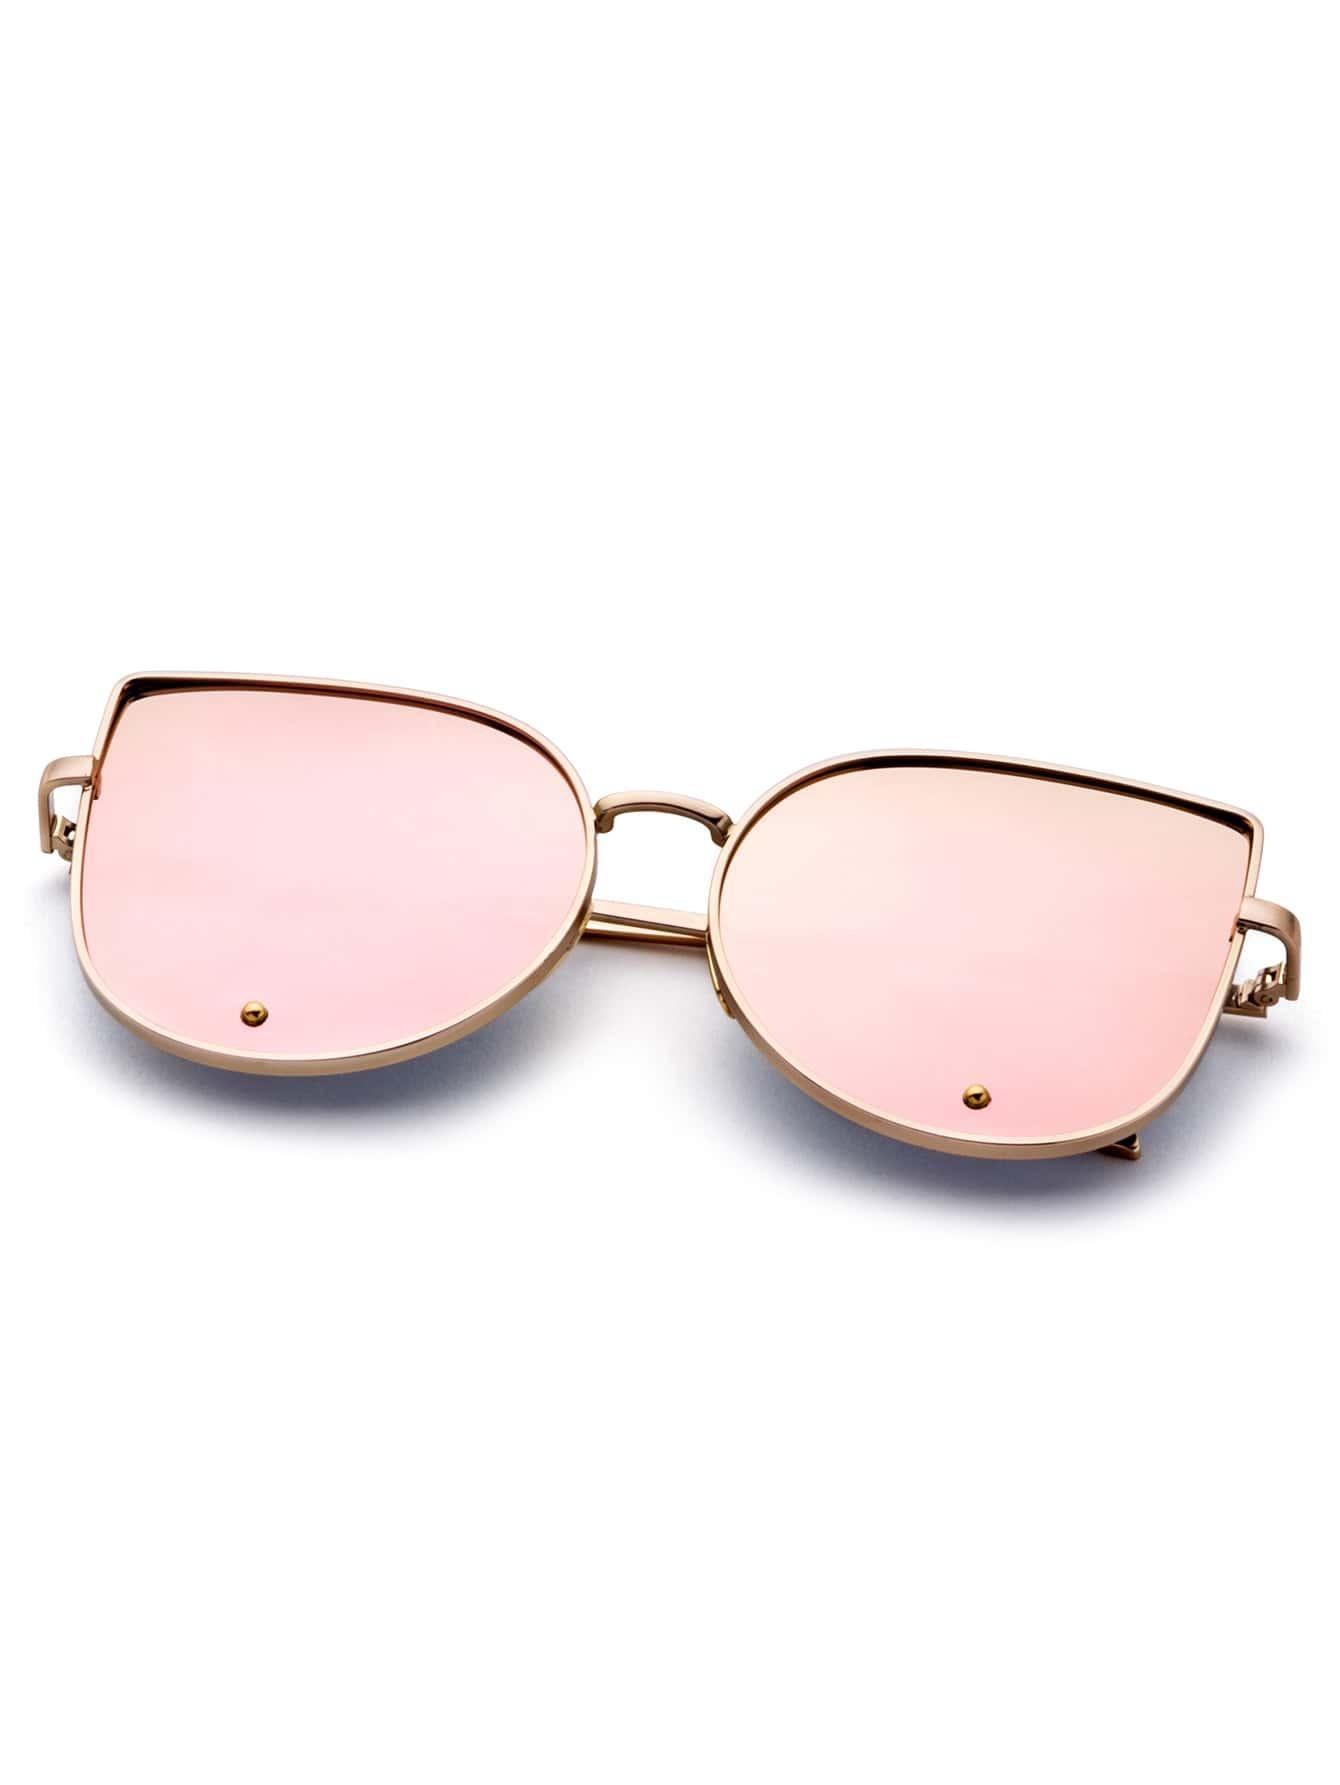 Gold Frame Cat Eye Sunglasses : Gold Frame Pink Cat Eye Stylish Sunglasses -SheIn(Sheinside)